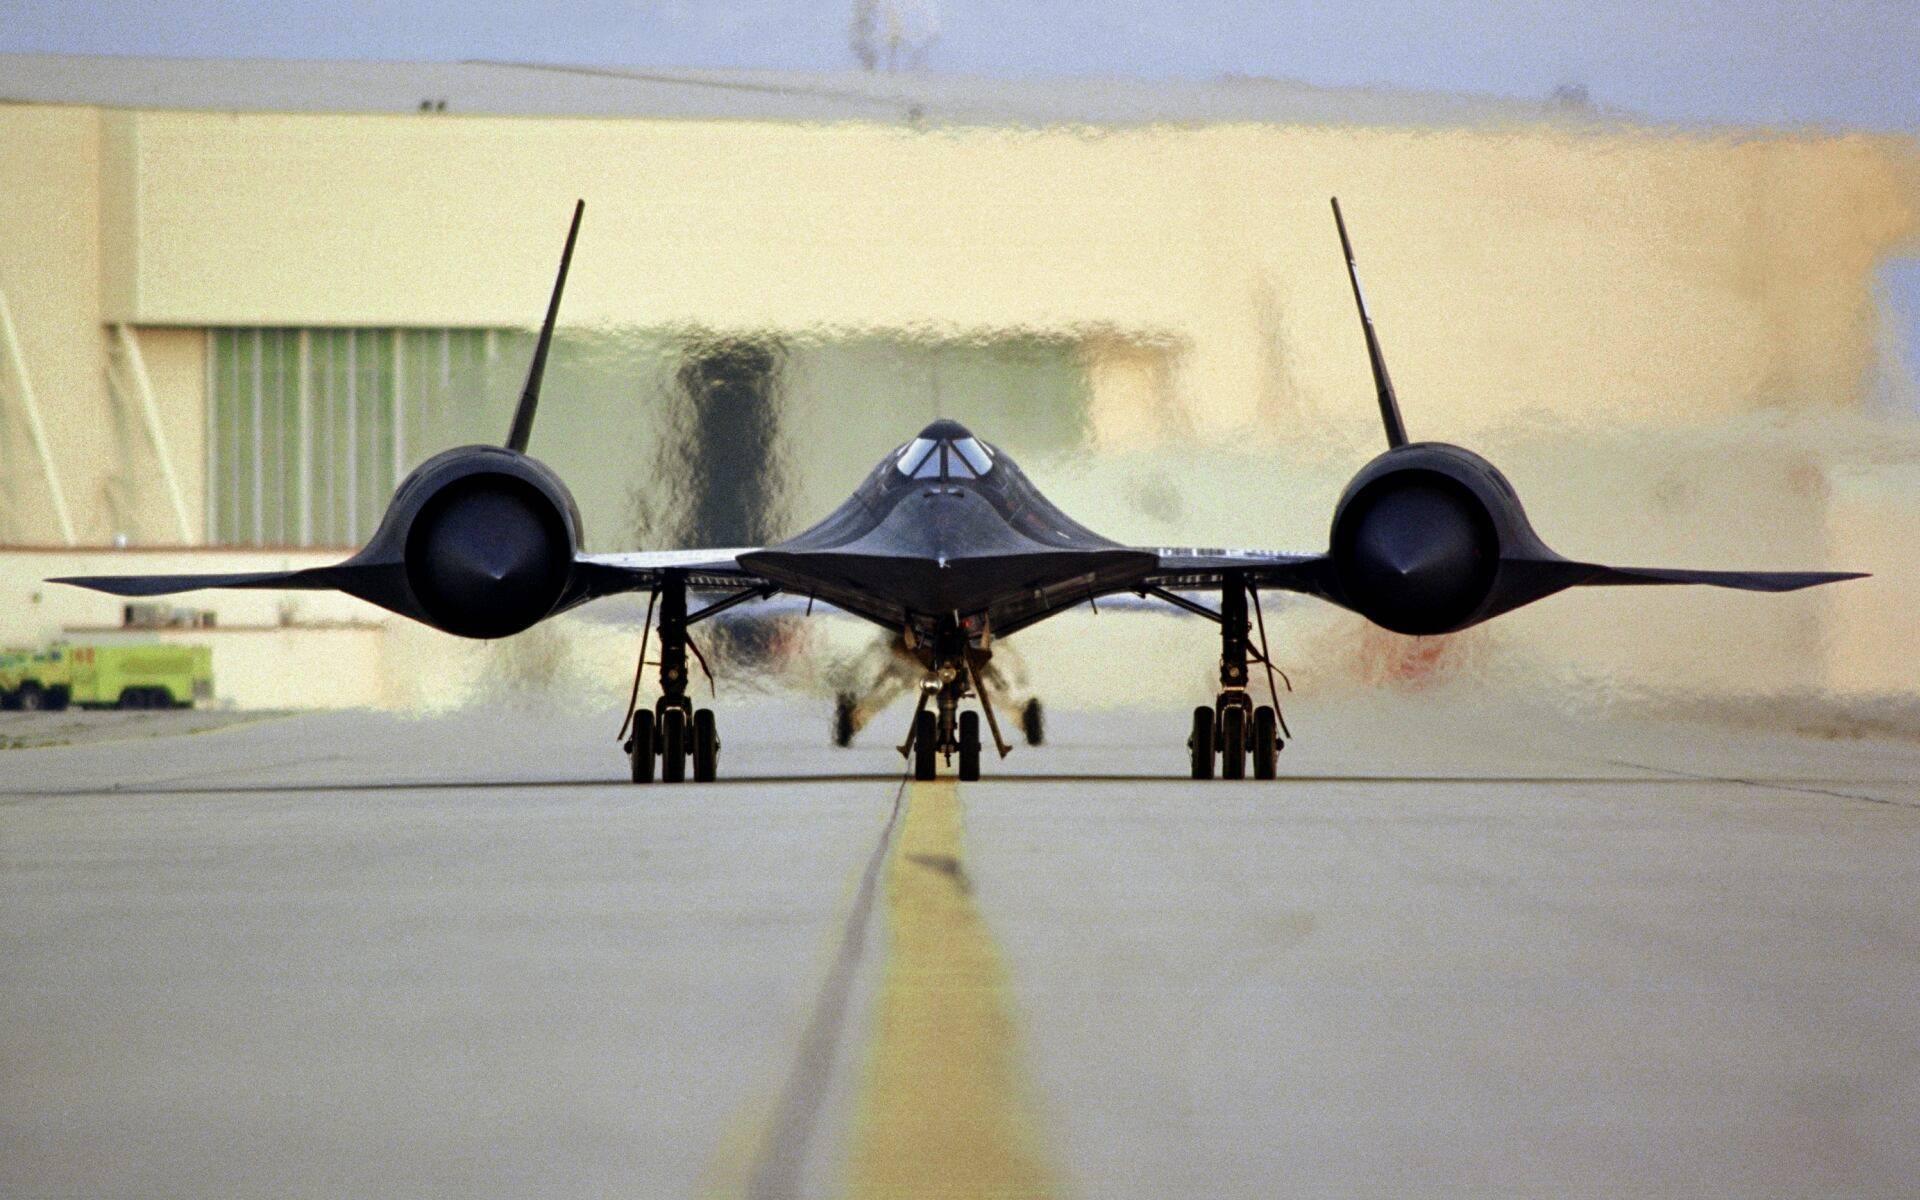 Lockheed sr-71 blackbird — википедия. что такое lockheed sr-71 blackbird